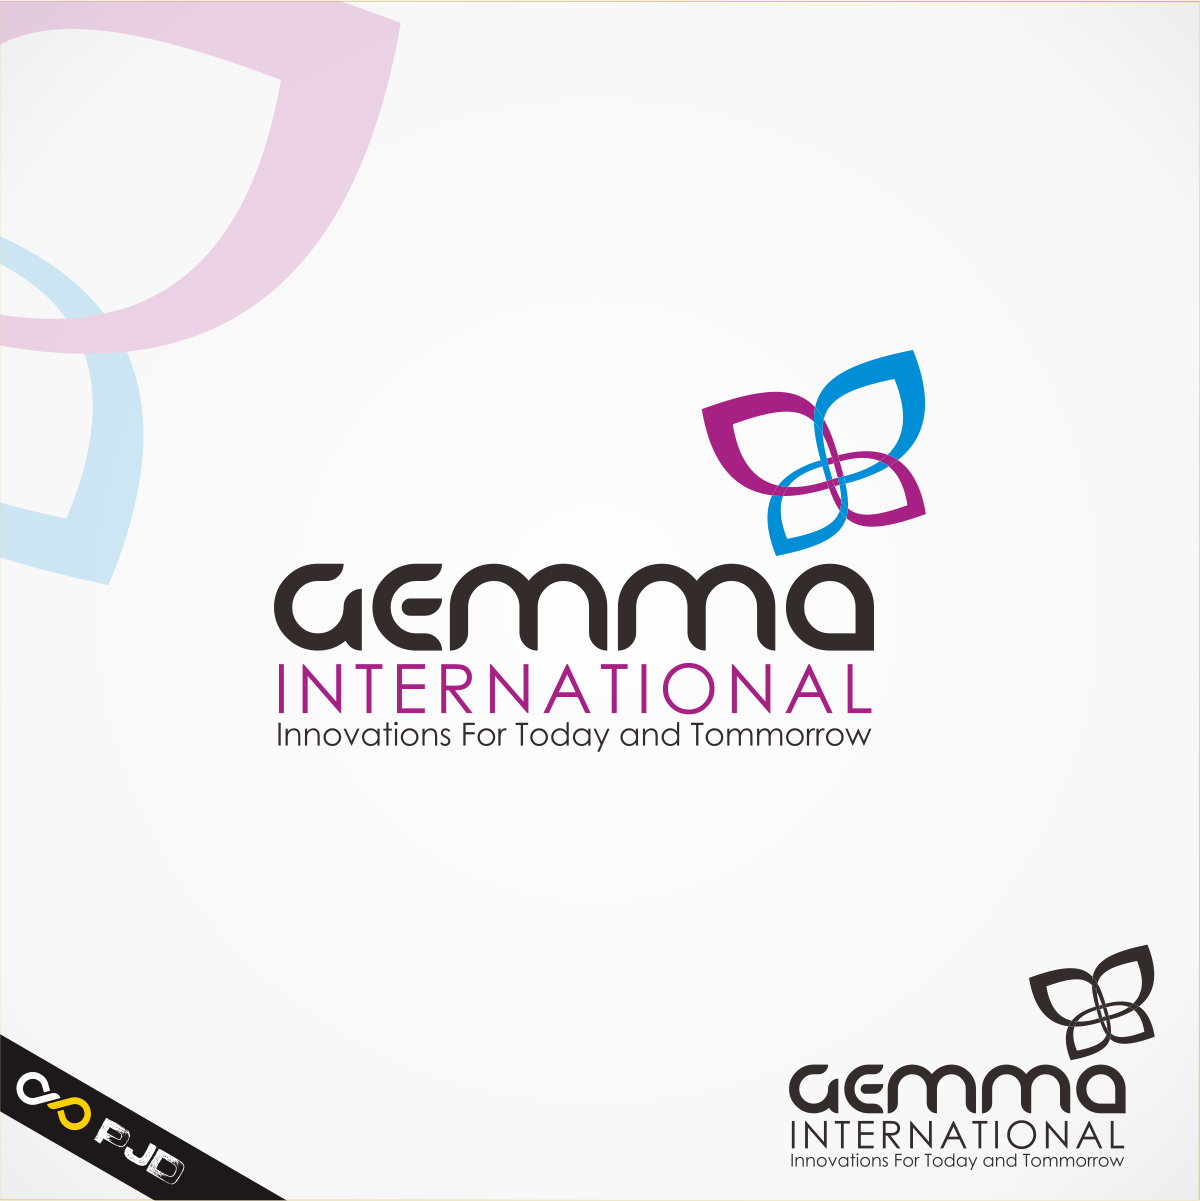 Logo Design by PJD - Entry No. 38 in the Logo Design Contest Artistic Logo Design for Gemma International.